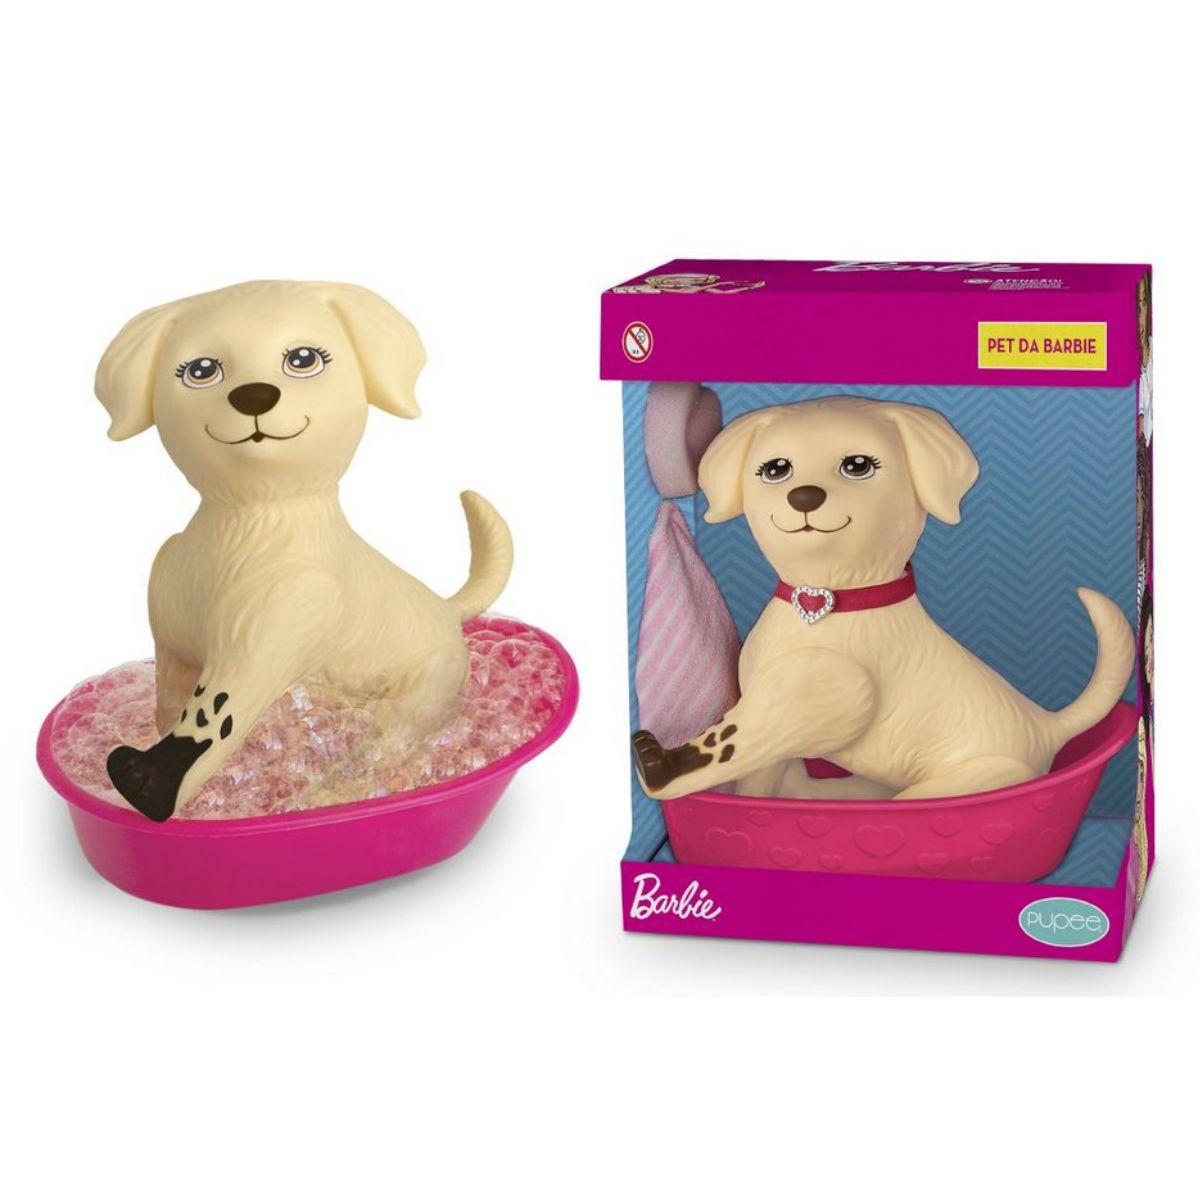 Honey - Pet Shop - Pets da Barbie - Mattel